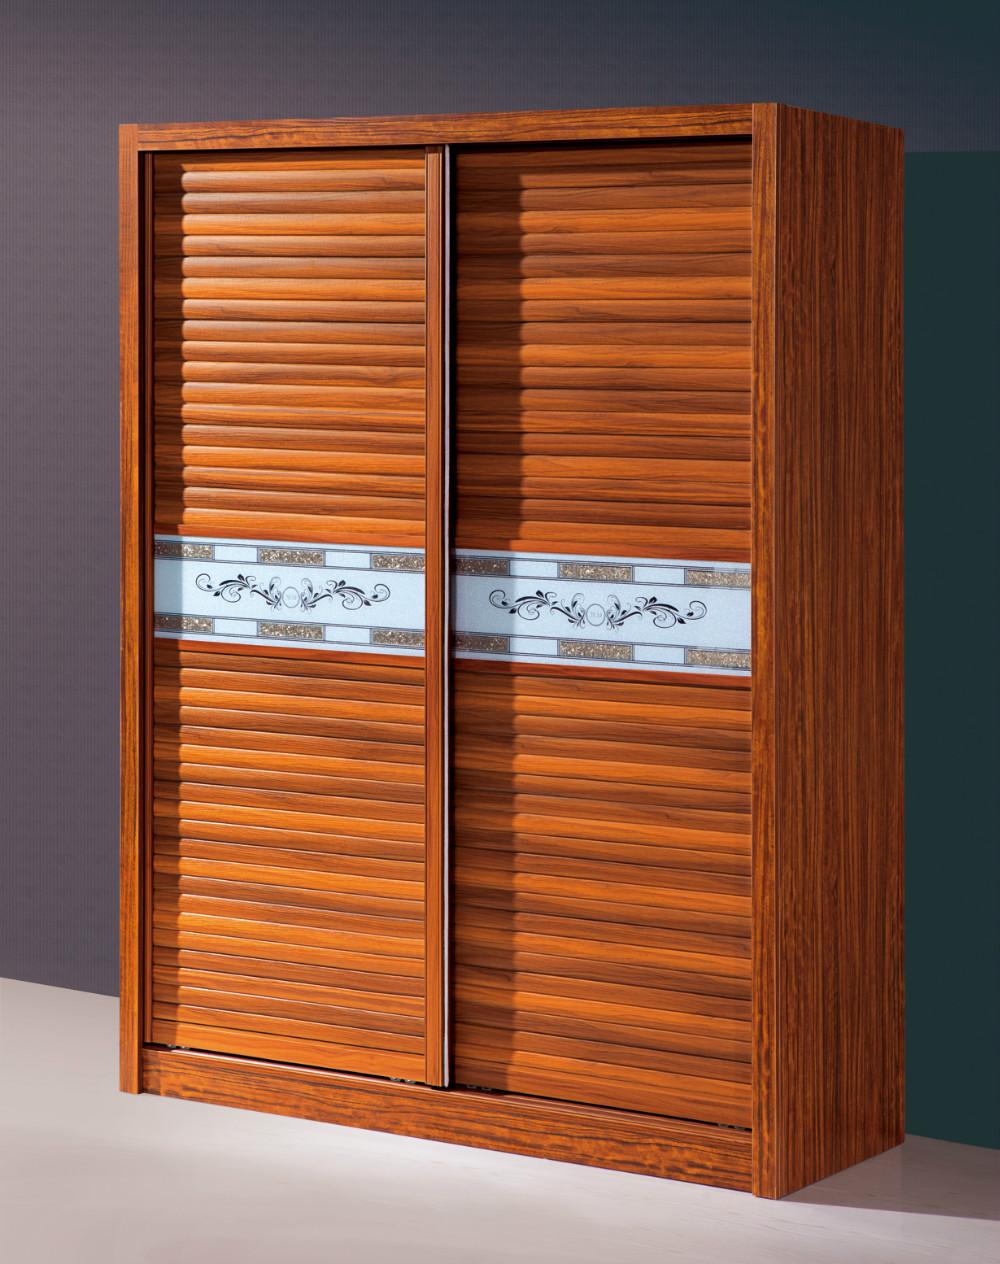 New arrival bedroom sliding wardrobe cabinet(China (Mainland))